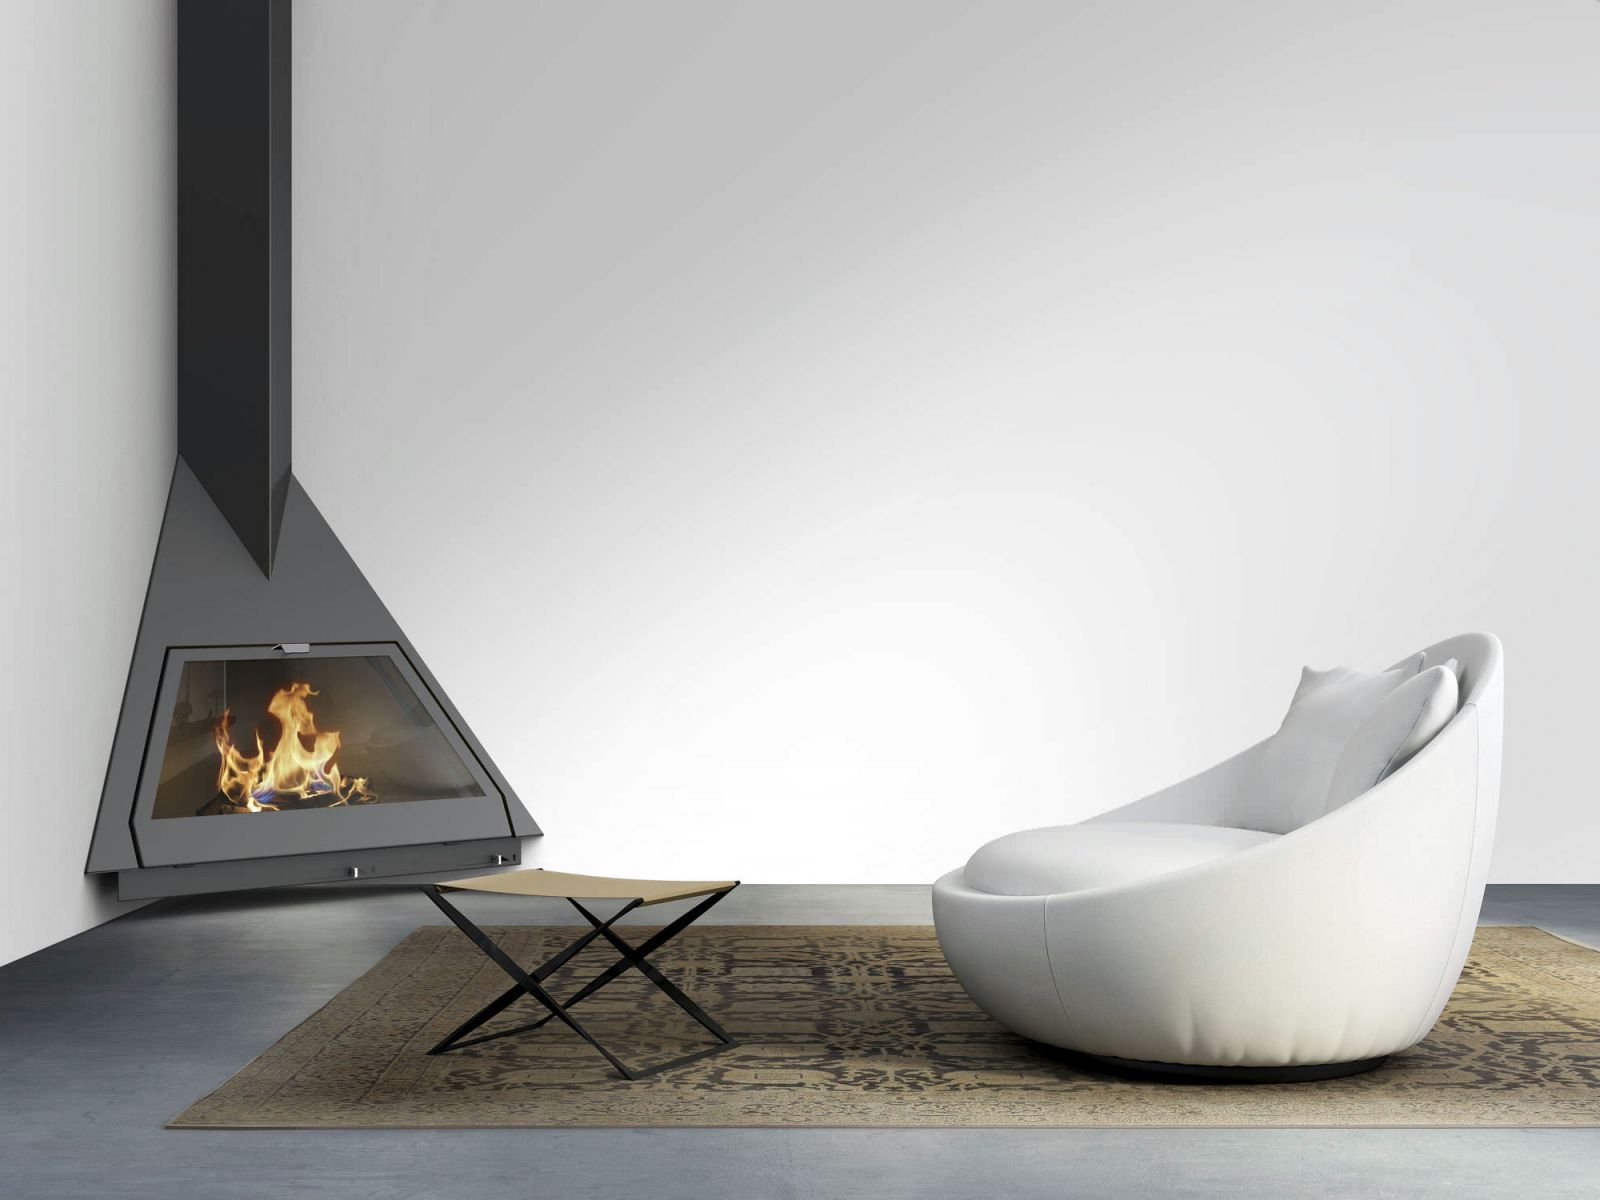 Belles Cheminees Design A Lyon En Rhone Alpes Cheminee Installateurs Et Vendeurs Marseille Cheminee Design Moderne